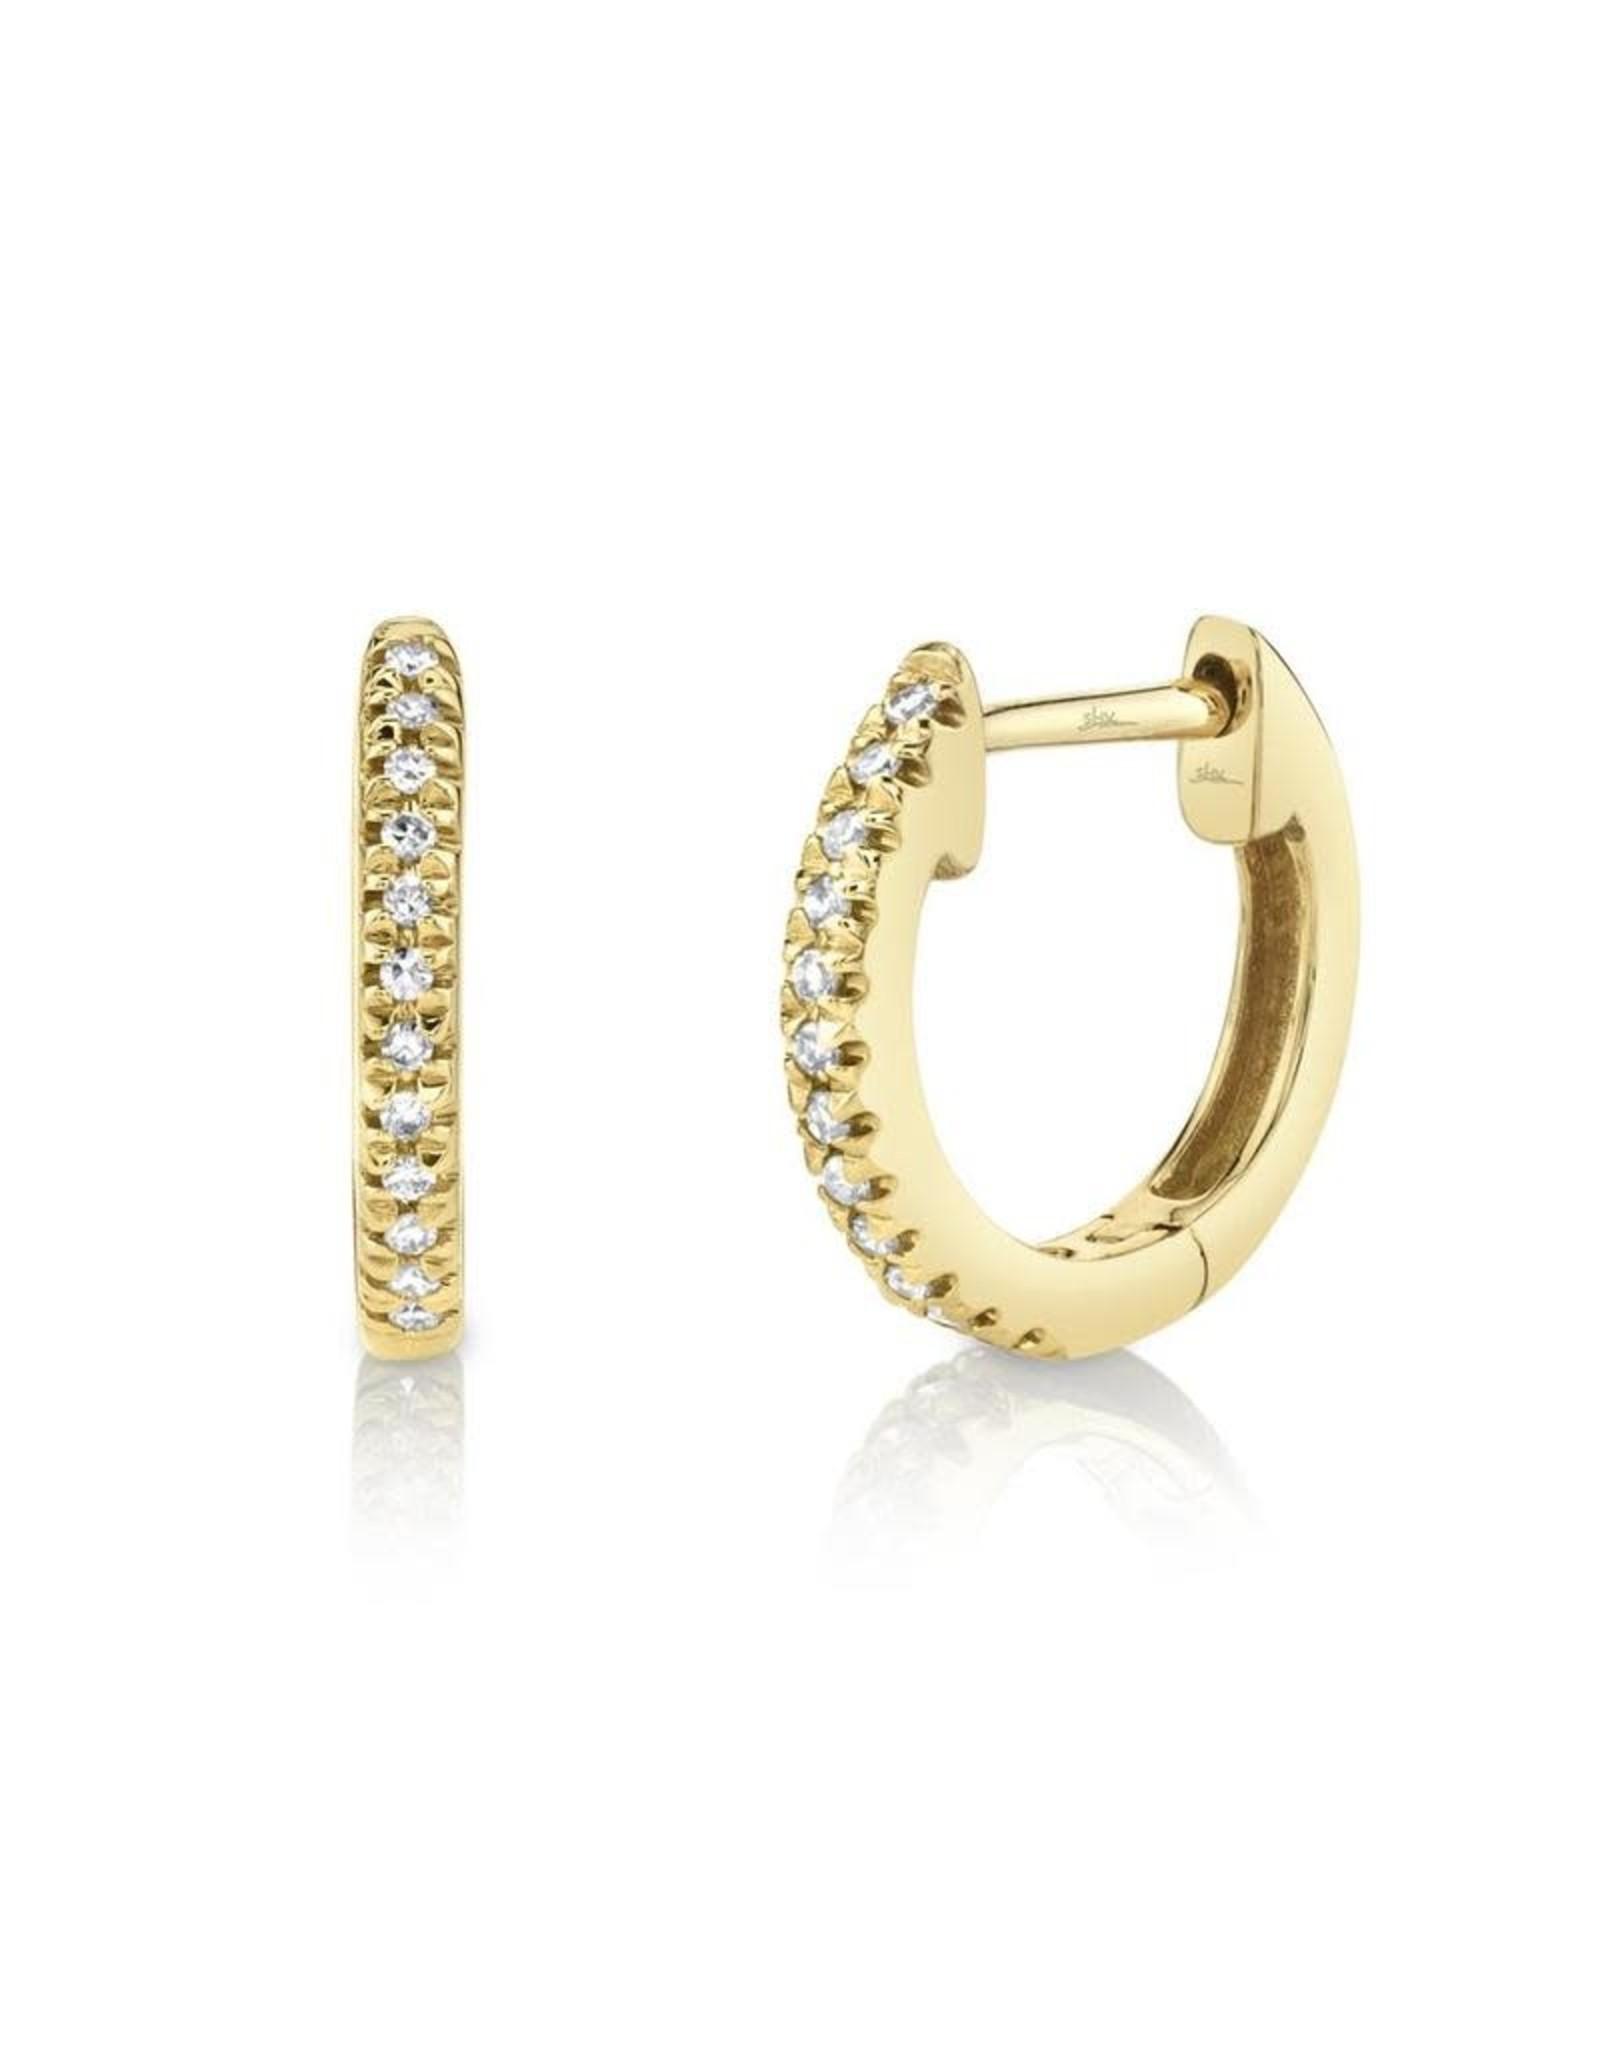 14K Yellow Gold Diamond Huggie Earrings, D: 0.07ct